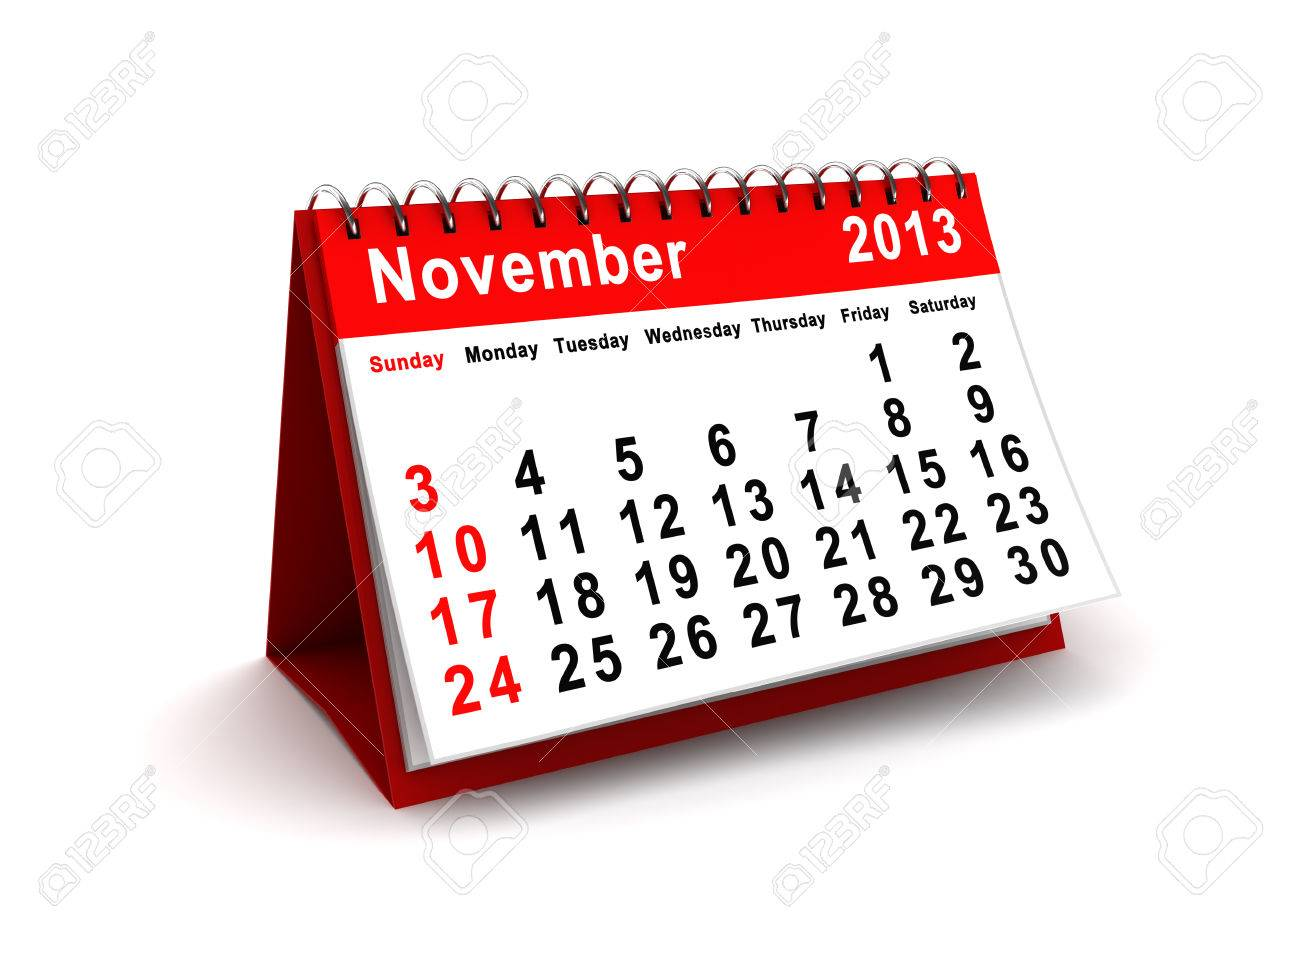 3d illustration of november 2013 calendar - 22920026